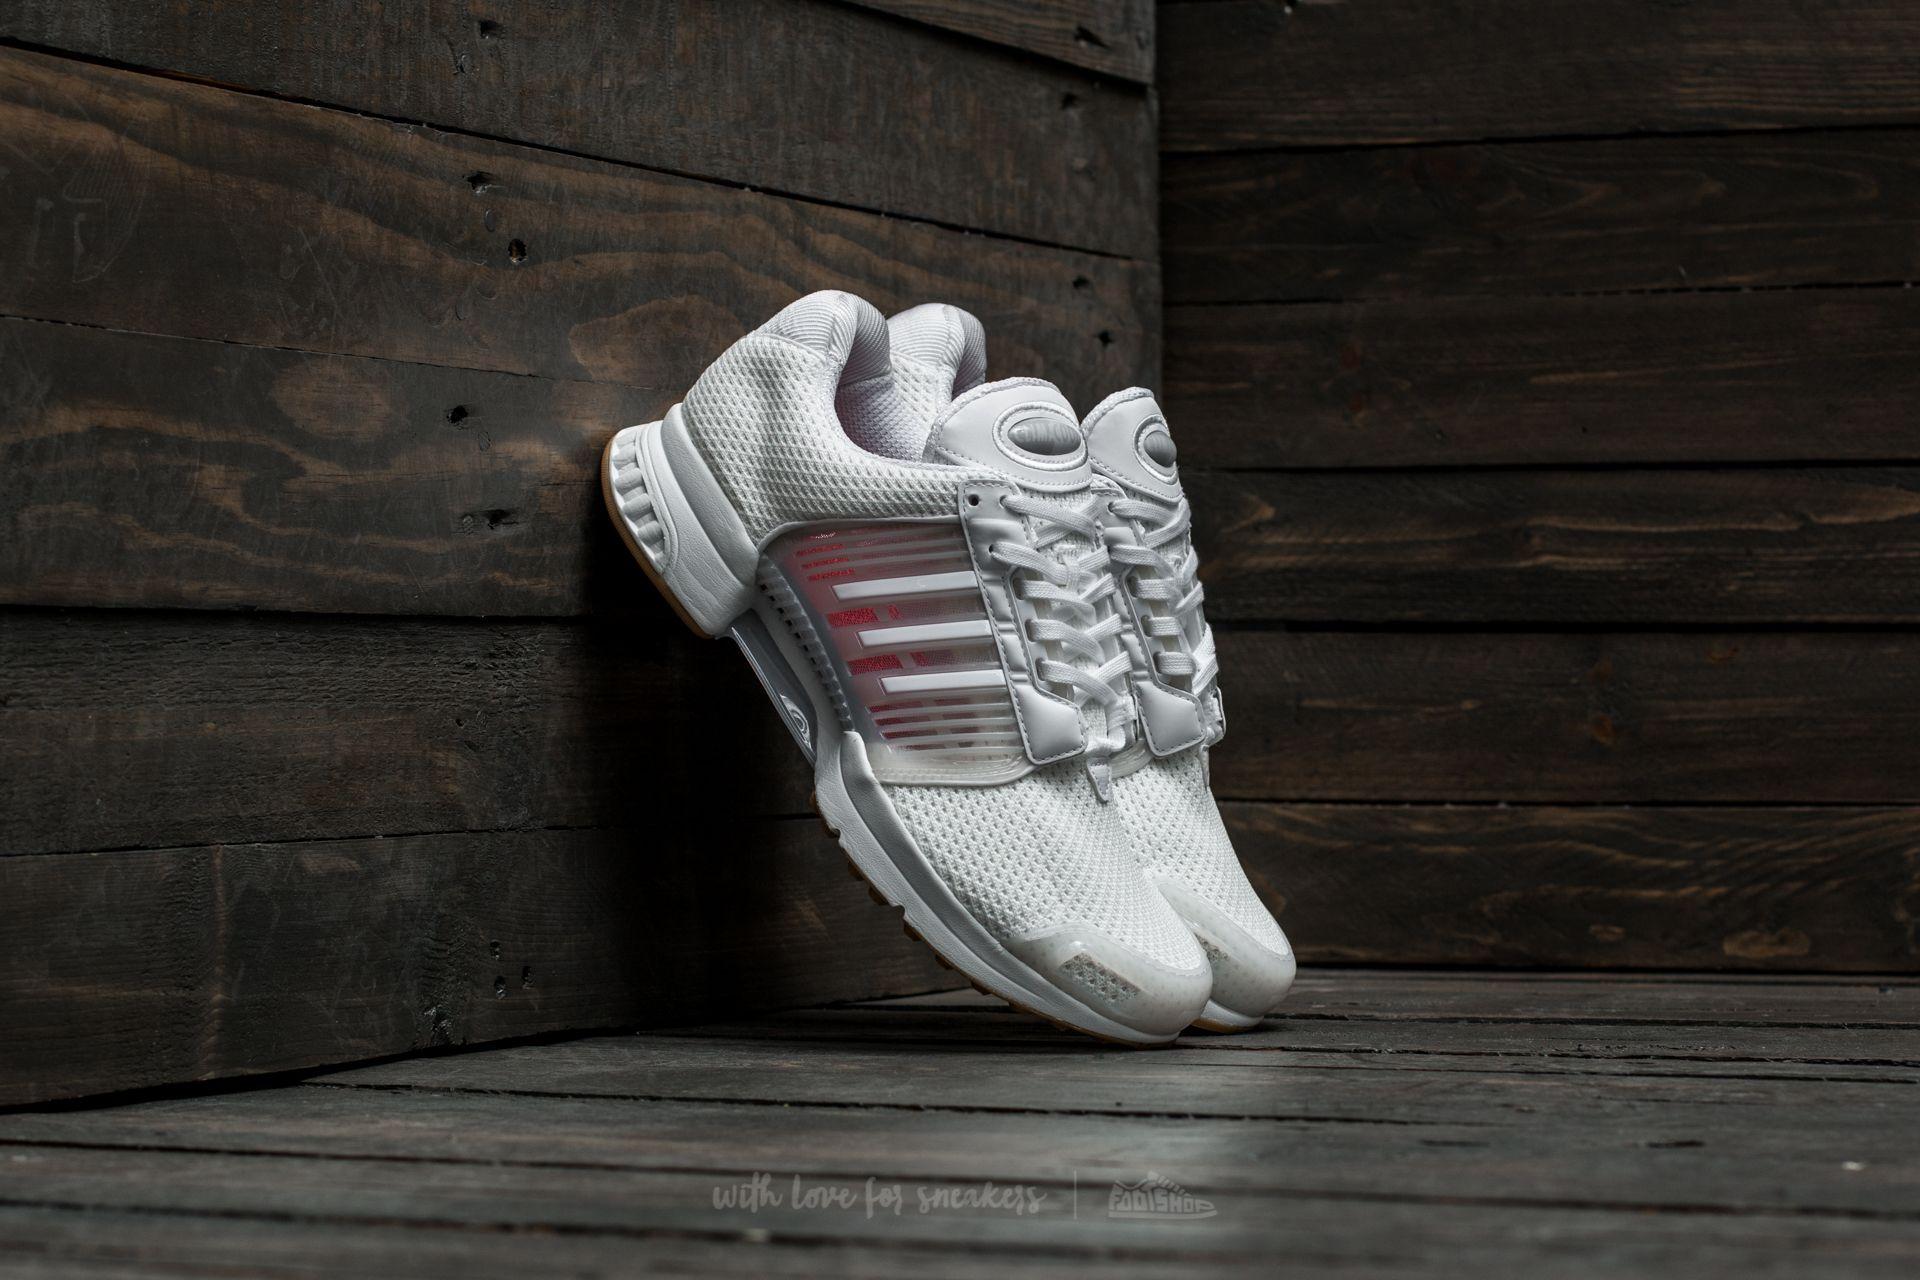 promo code baee3 a233e adidas Climacool 1. Footwear White  Footwear White  Gum